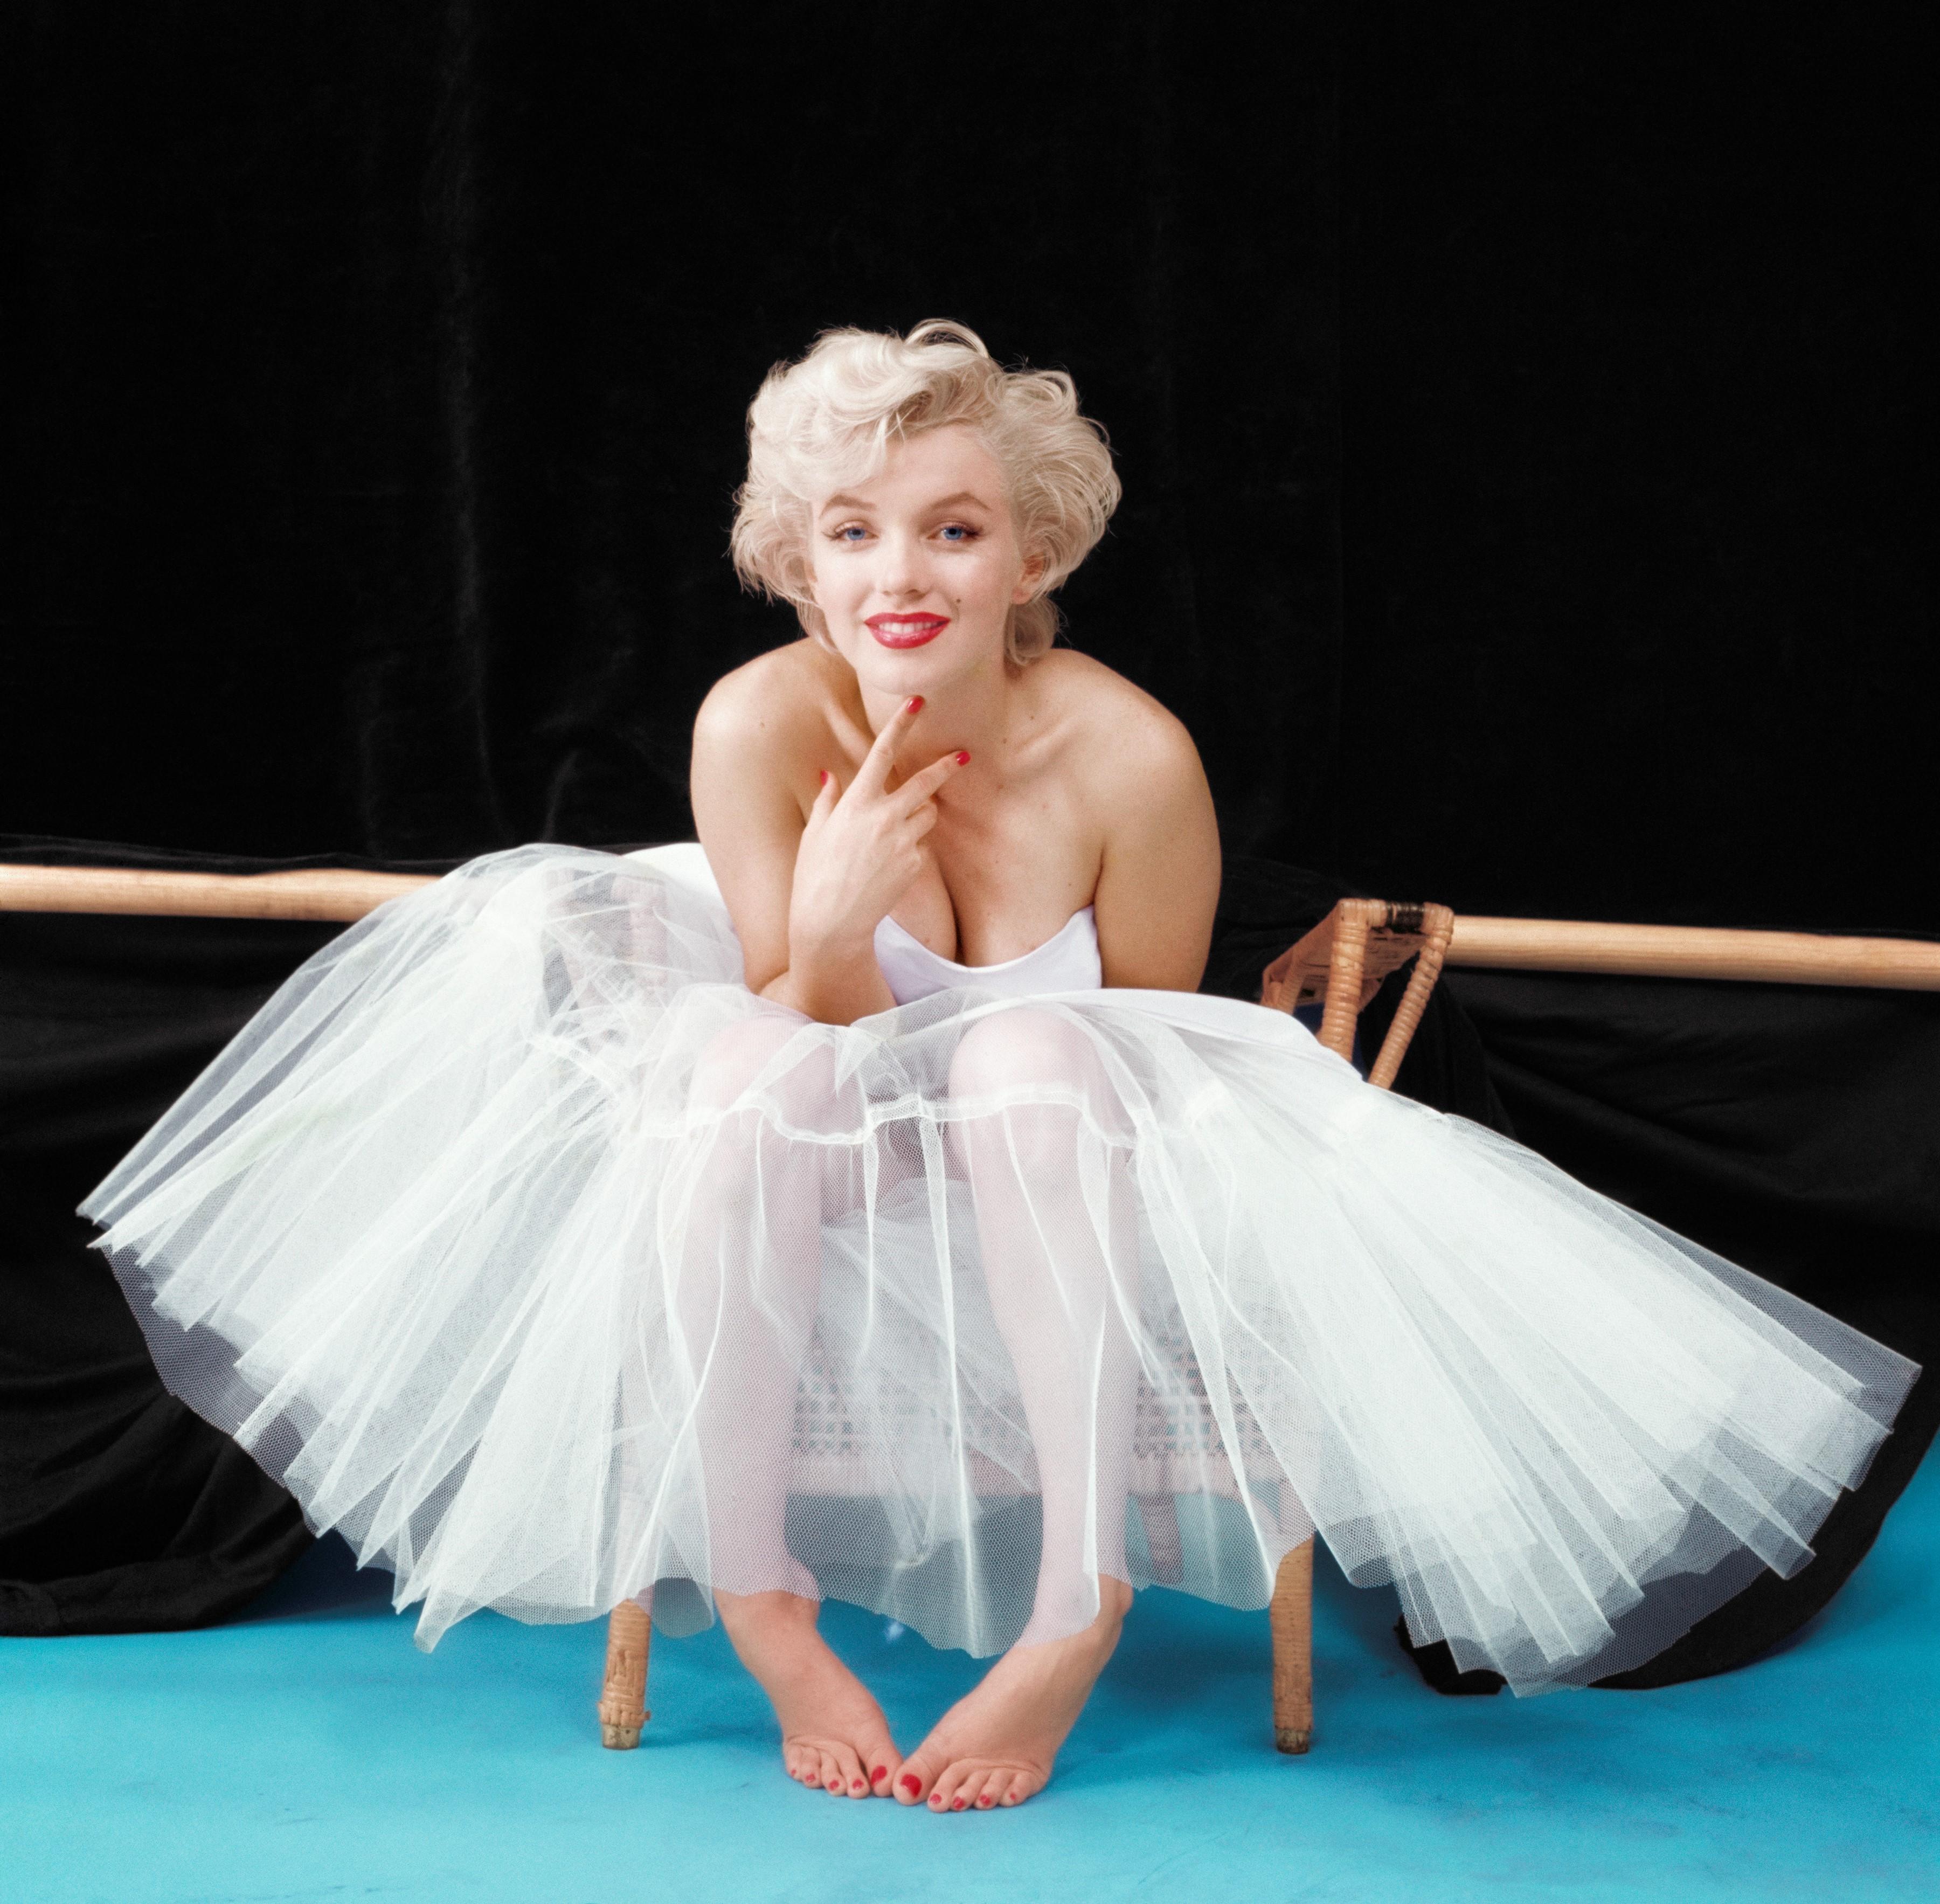 marilyn_monroe-milton_greene-ballerina_5d23539b75162.jpg